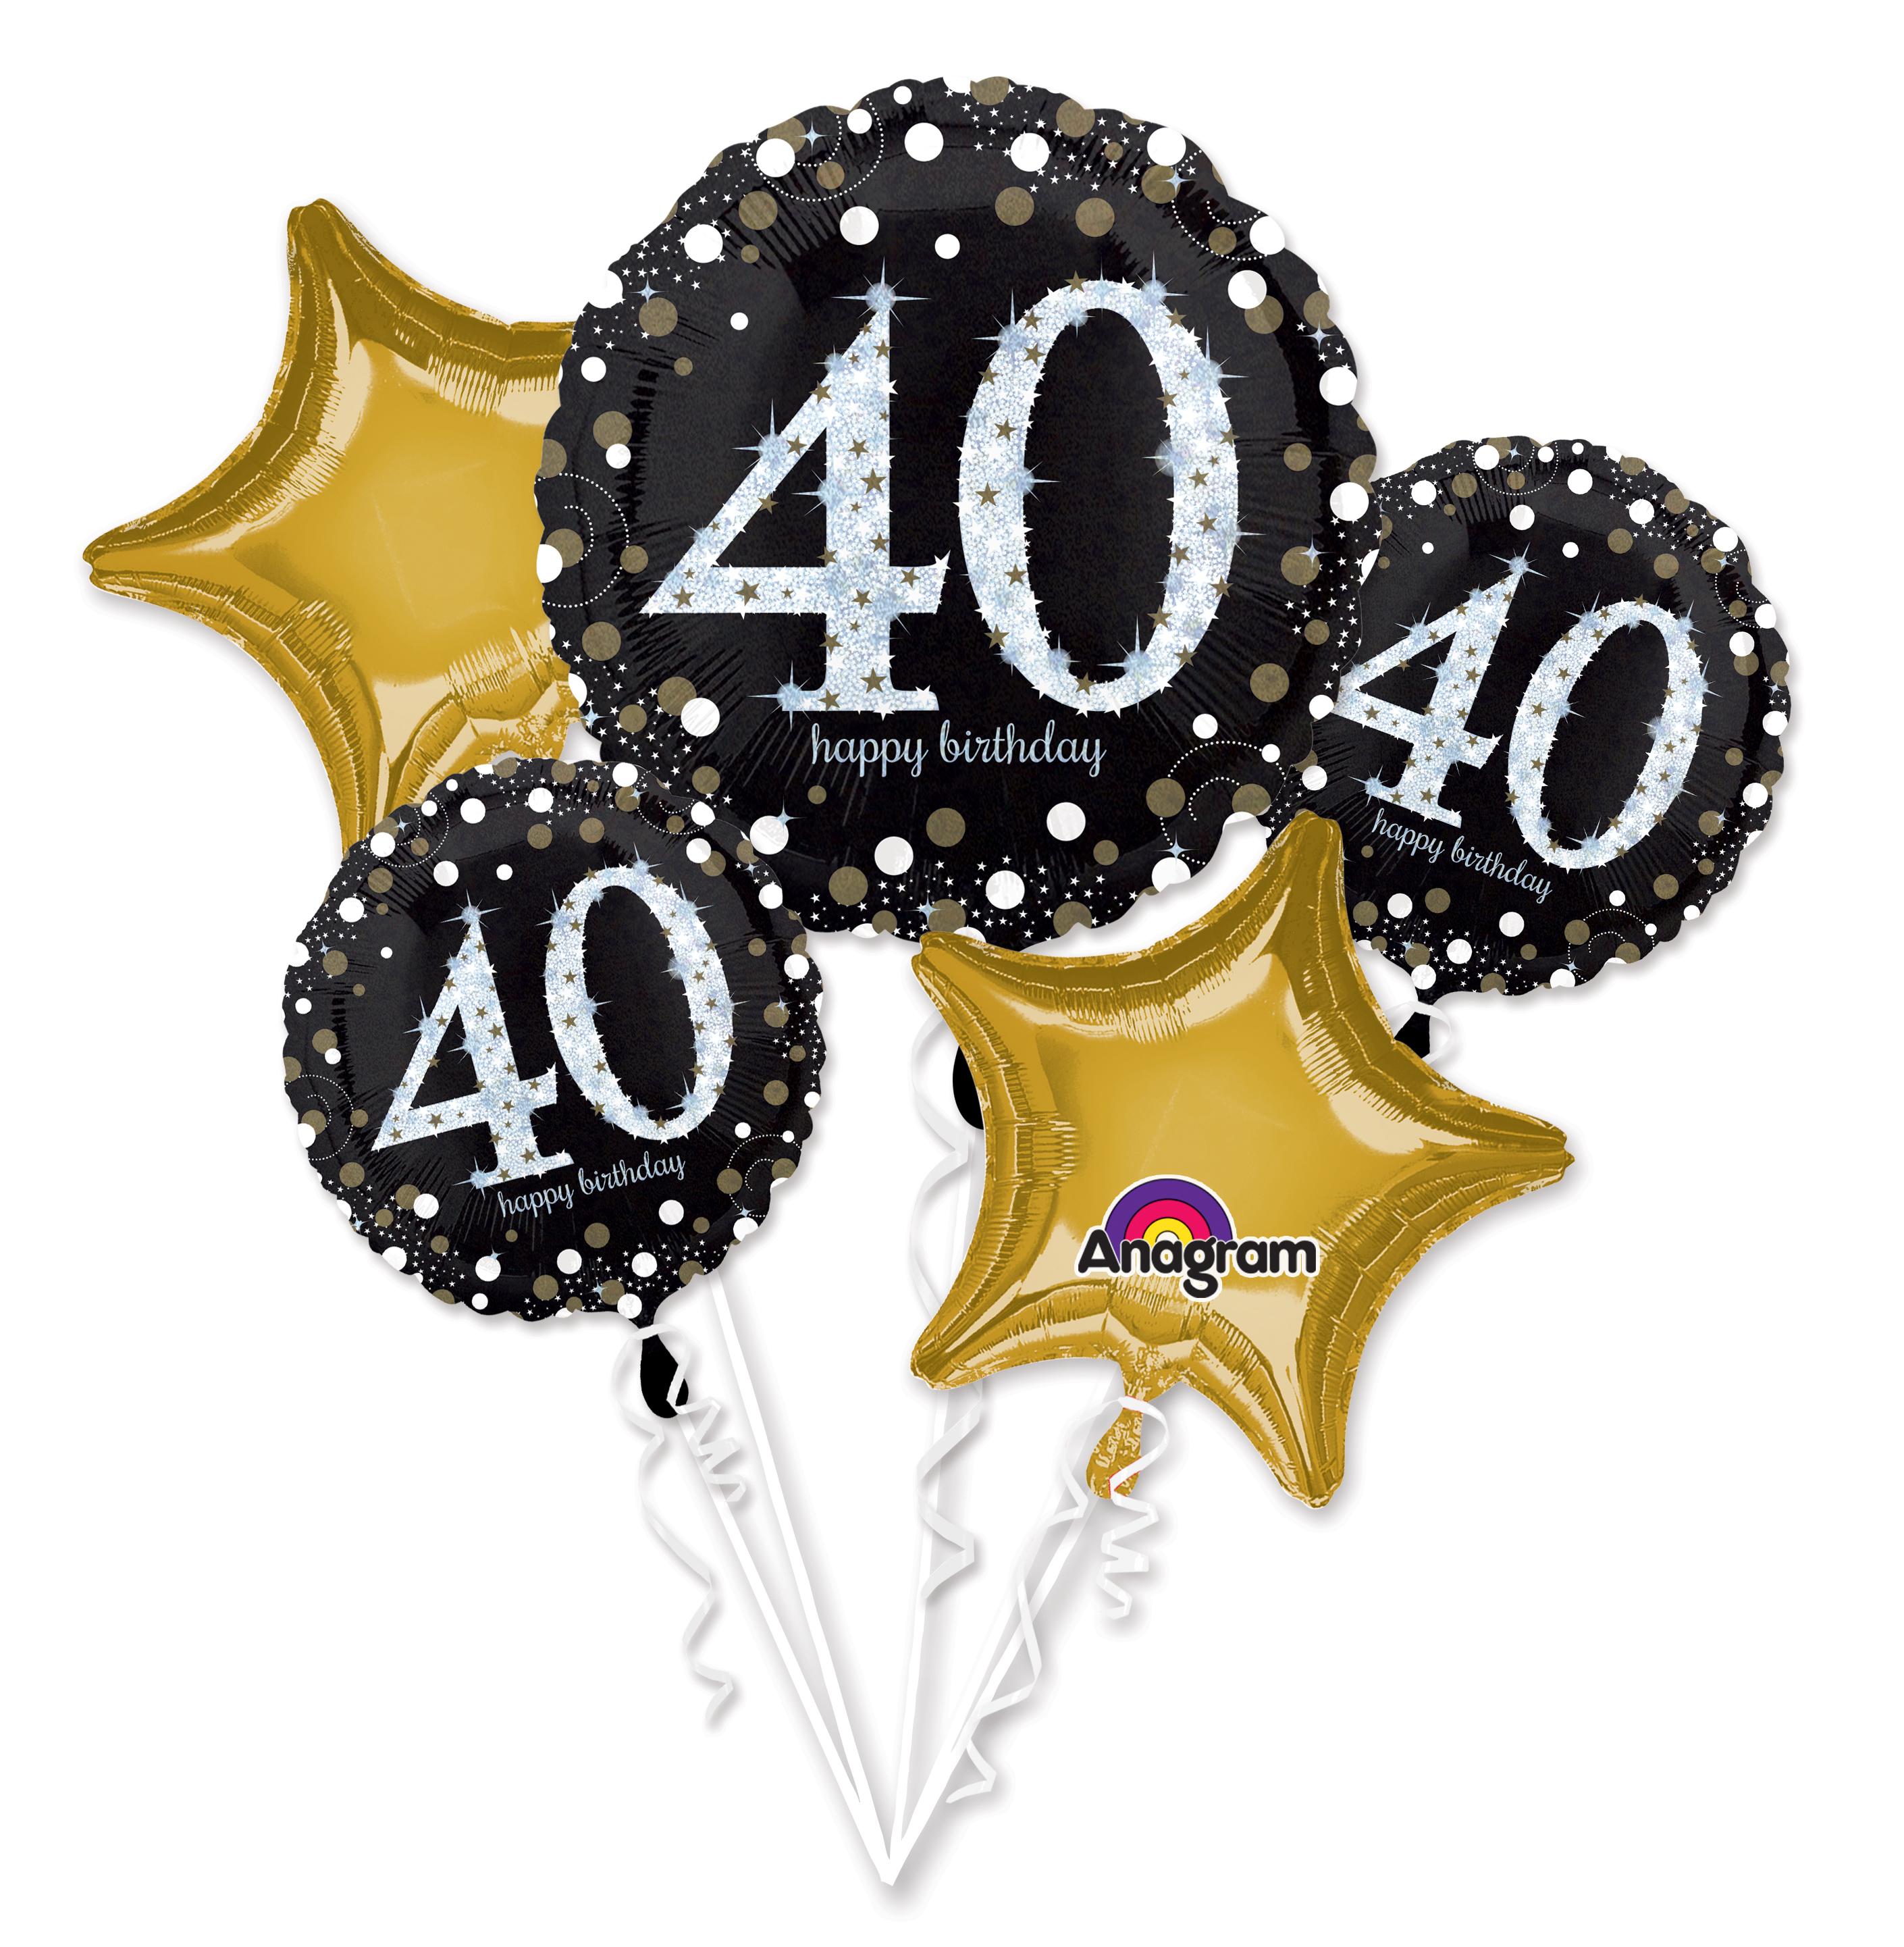 Bouquet Sparkling Birthday 40 Balloon Packaged